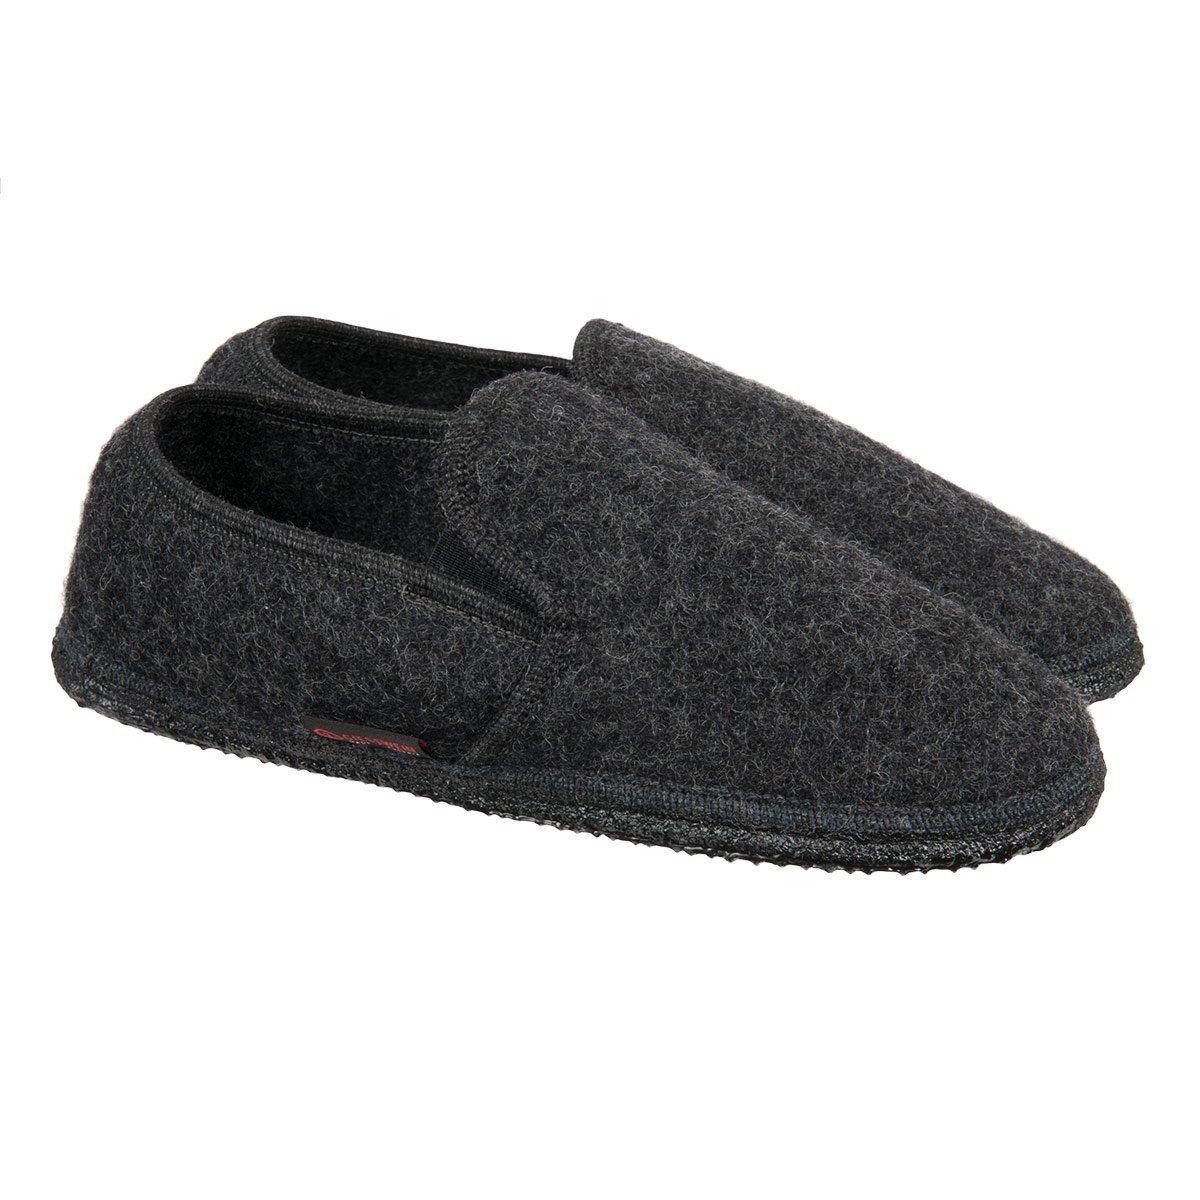 93a436f4e8584 Pantofole per uomo e donna firmate Giesswein modello Niederthal con suola  antiscivolo ...